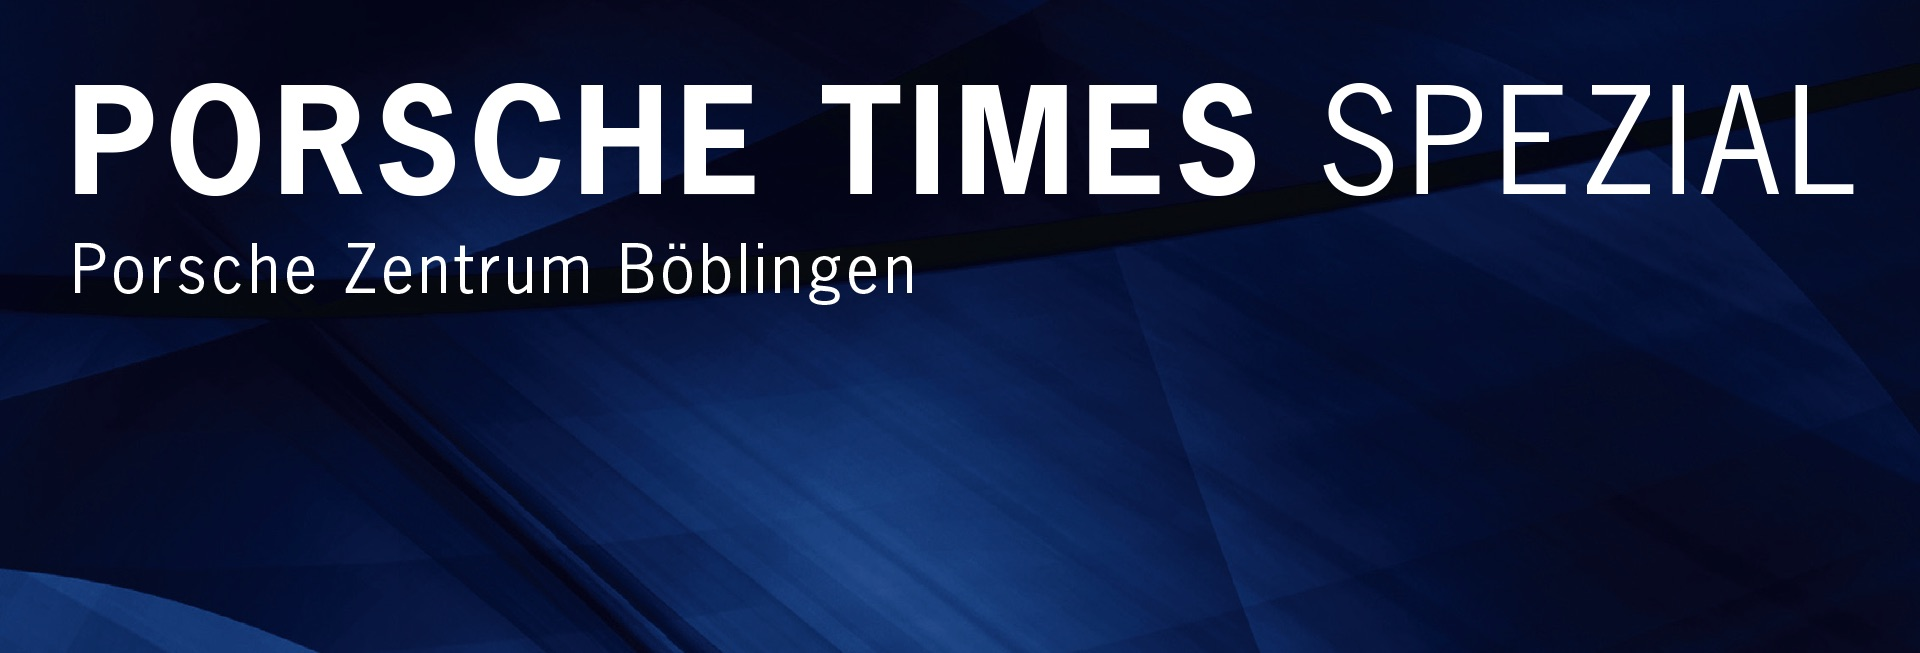 Das Porsche Times Spezial Magazin